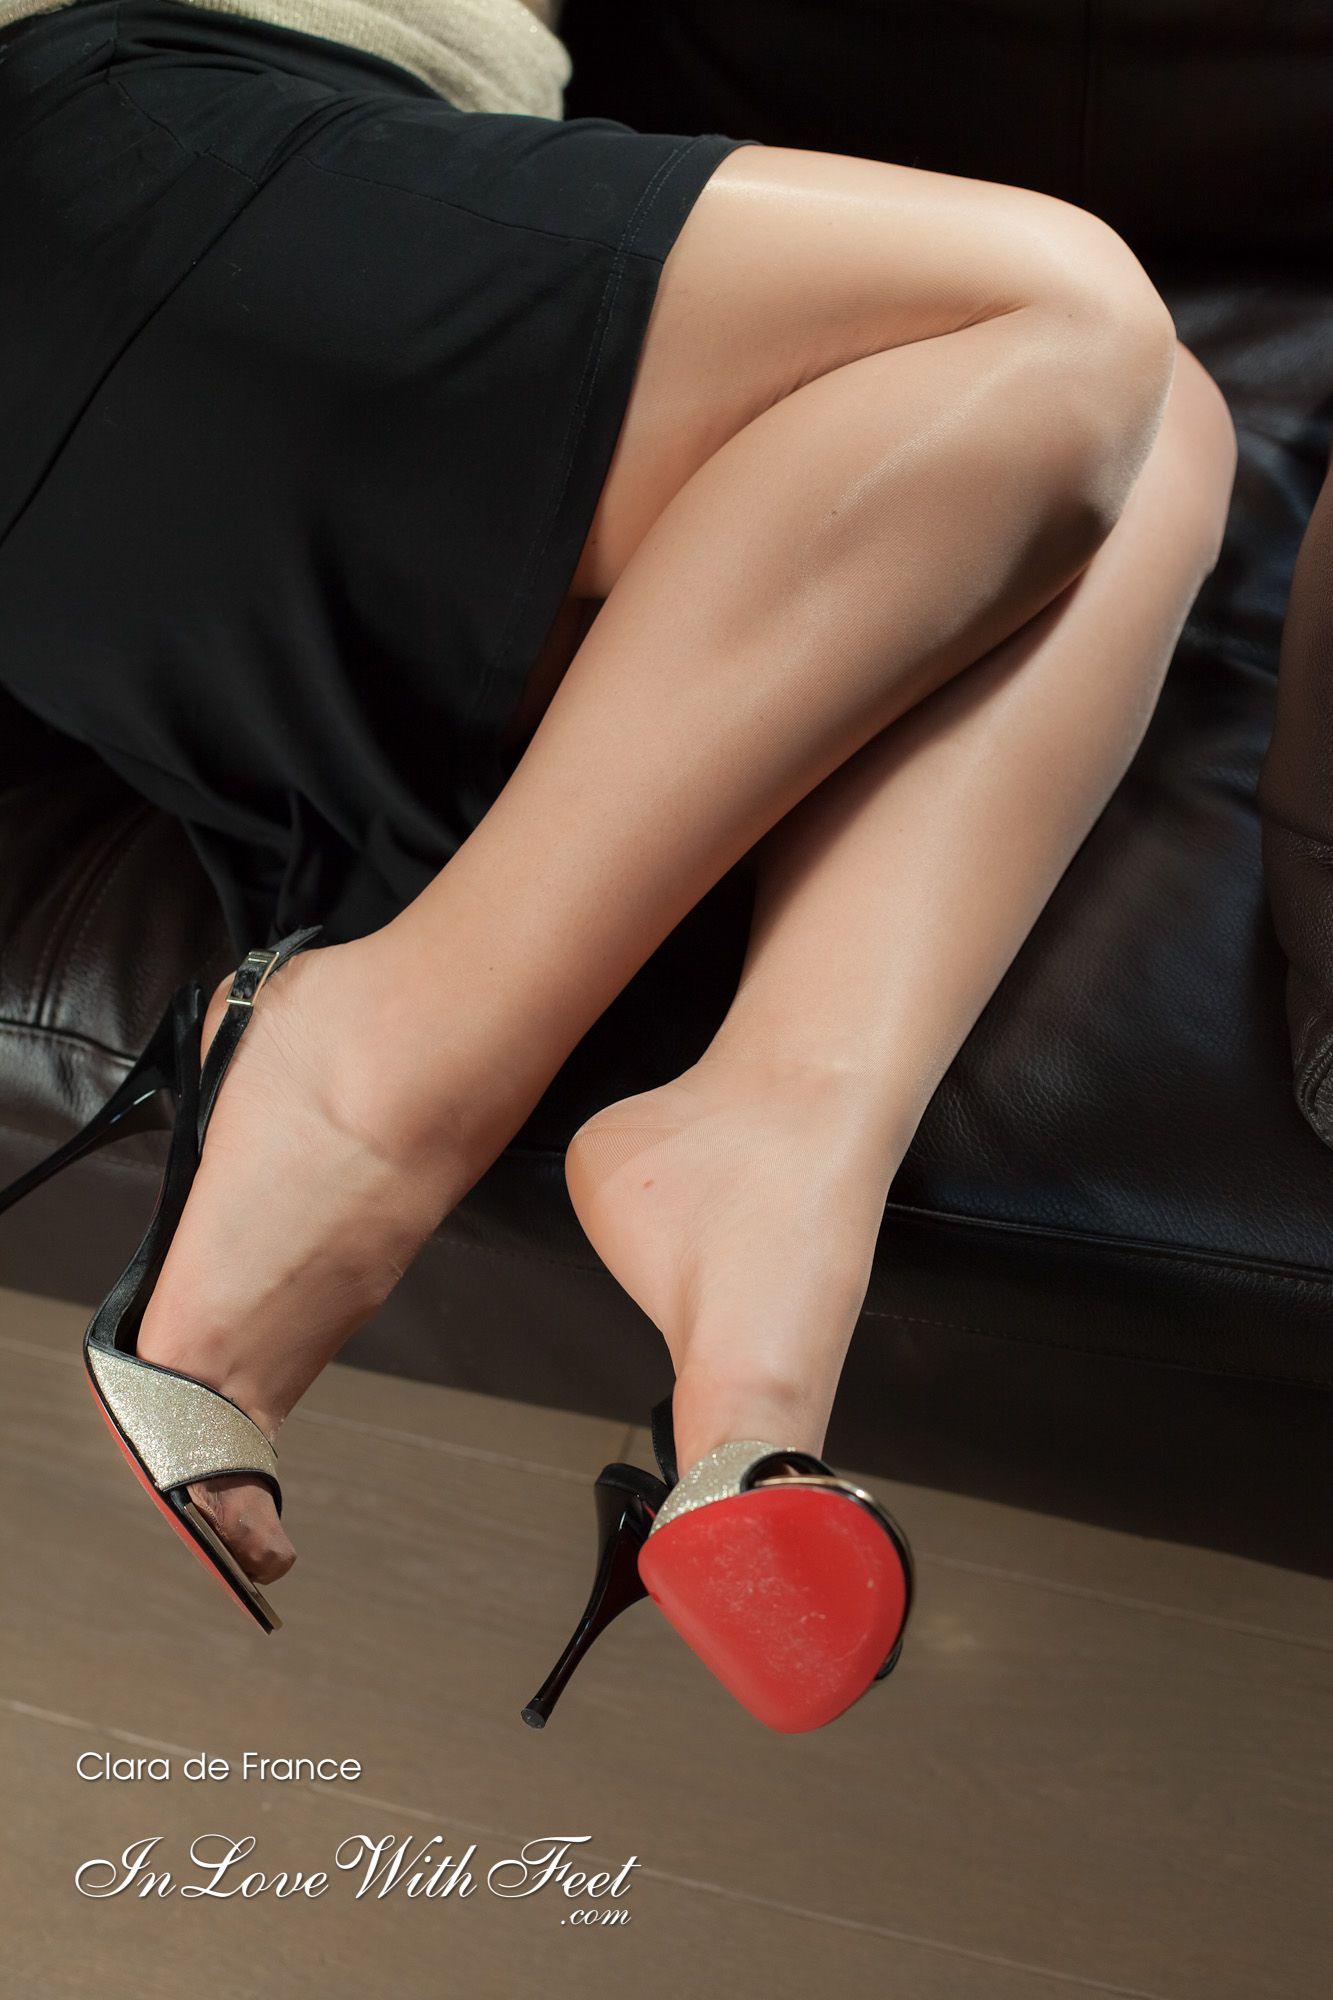 Womens Bedroom Slippers In Love With Feet Clara De France Sexy Nylon Legs N